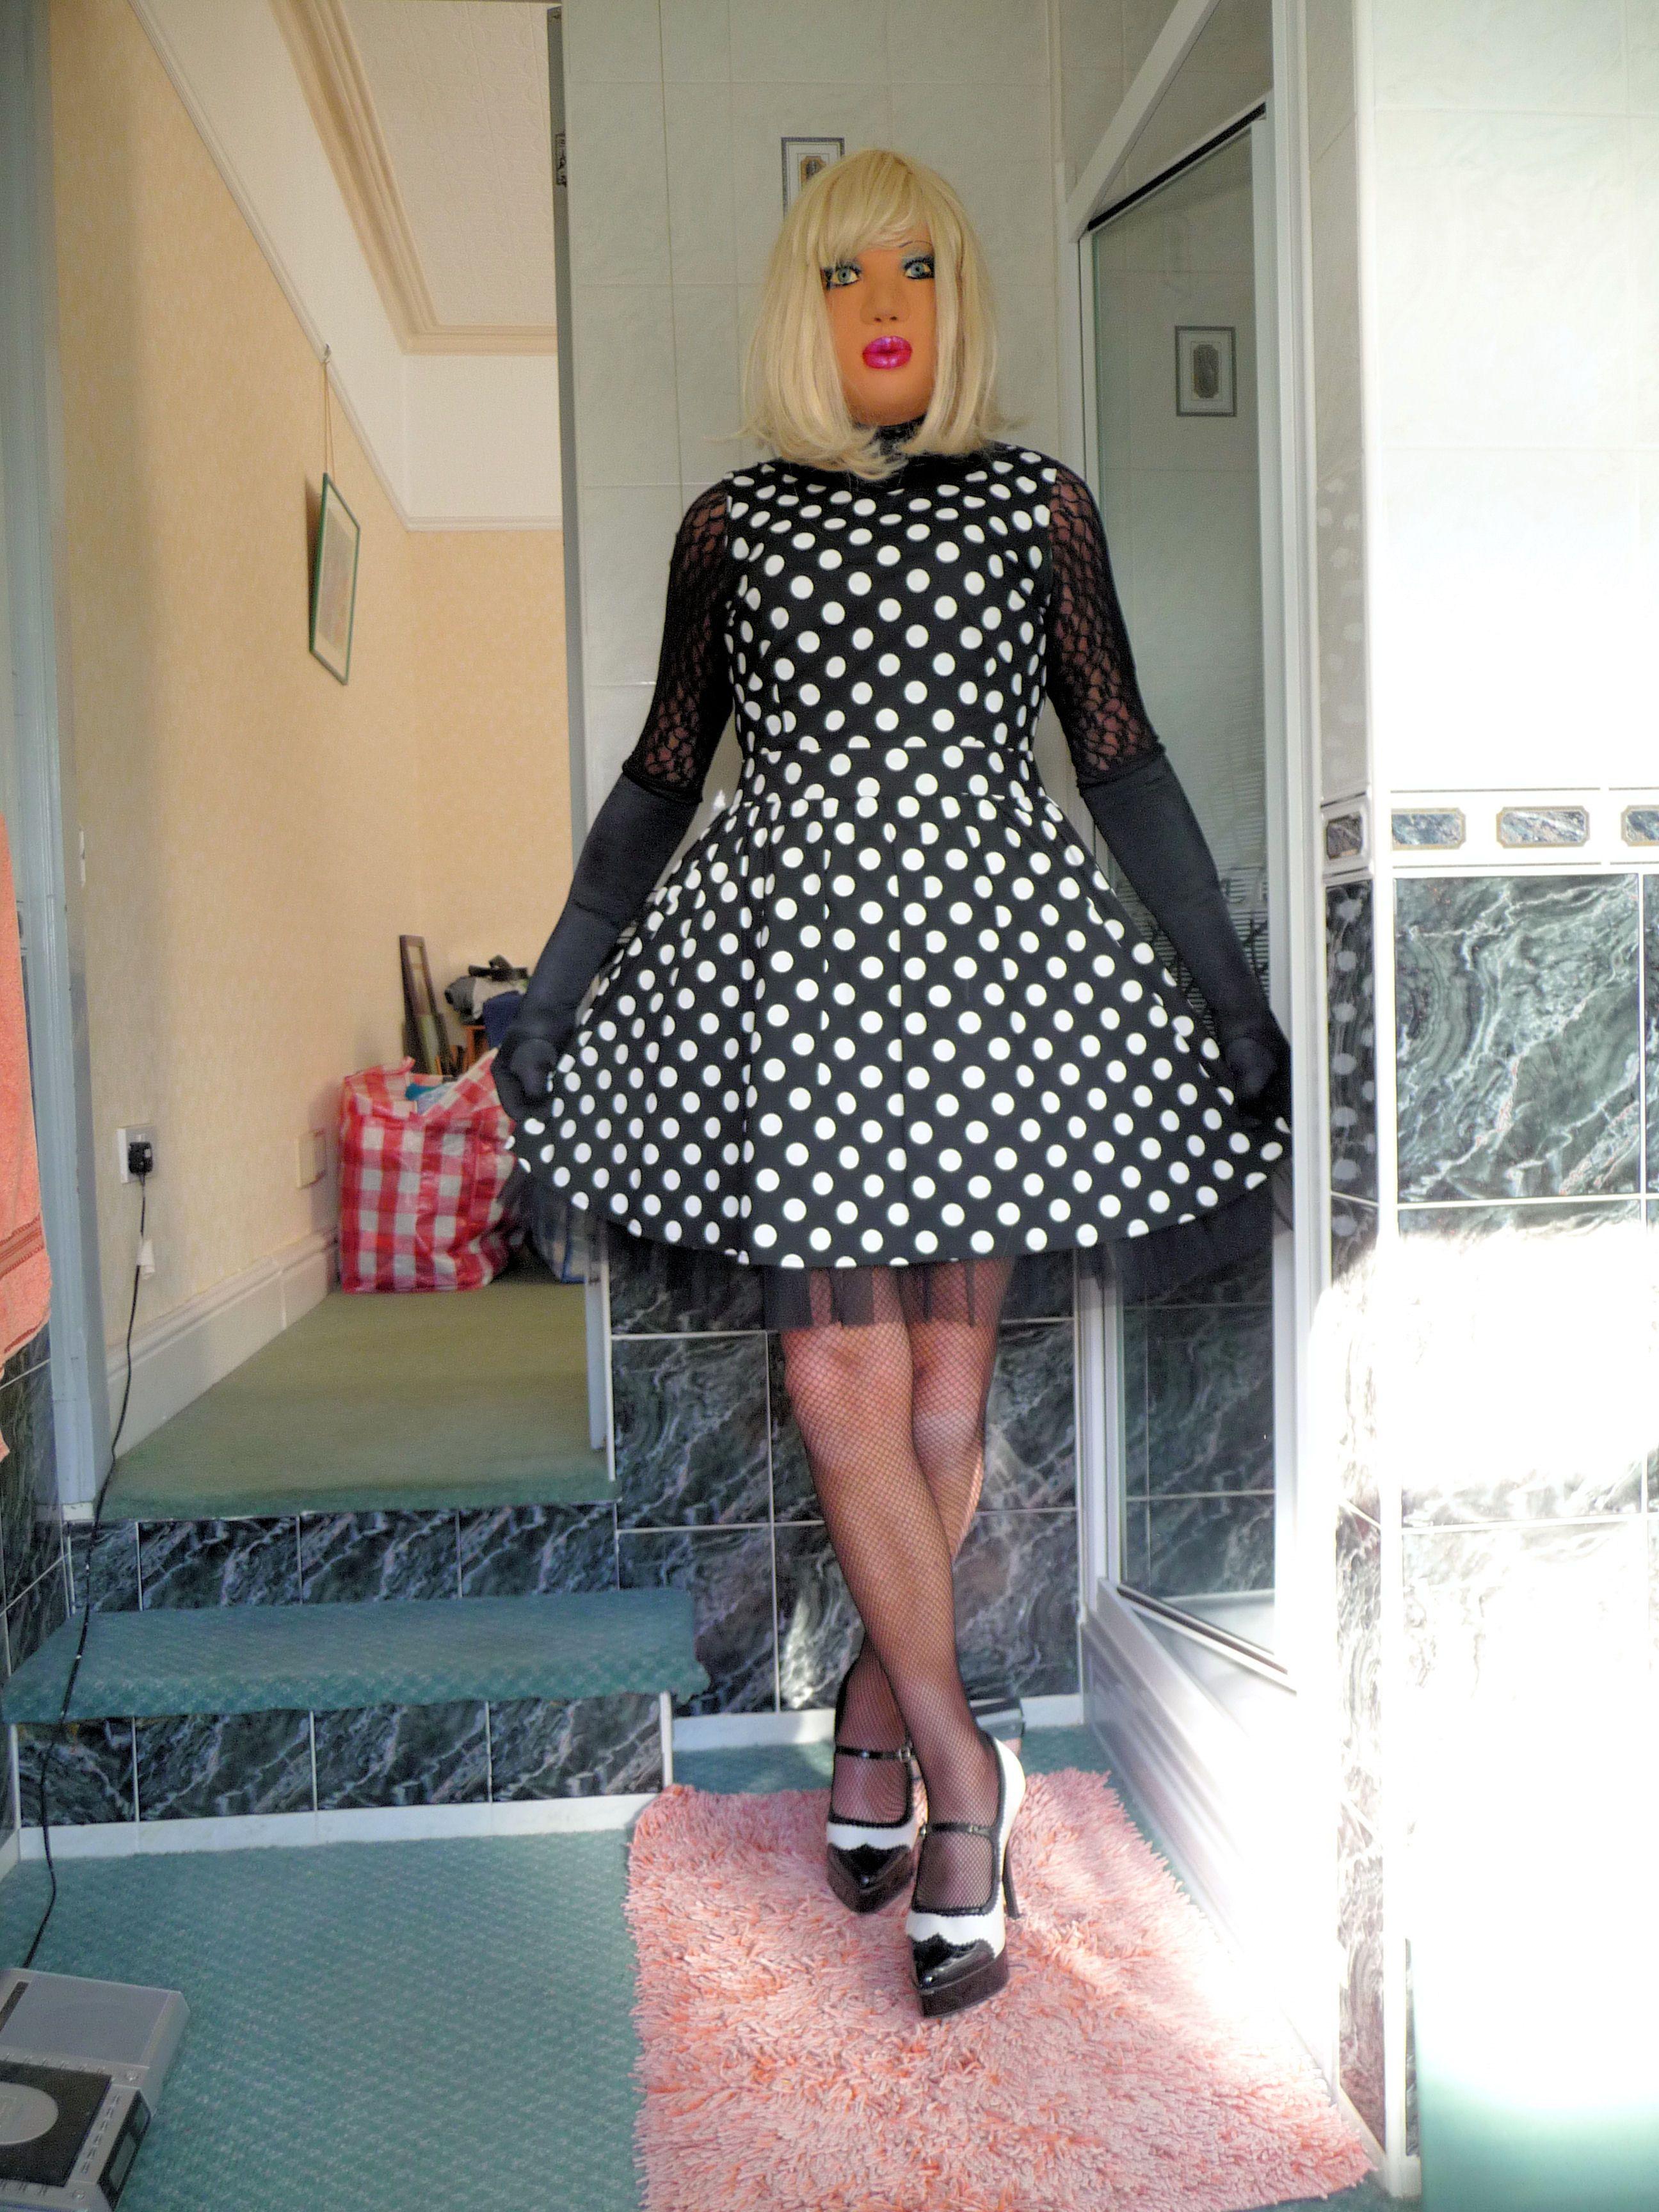 aff85d98cc28 Tania Sissy   Sissy transvestite   Polka dots, White polka dot dress ...